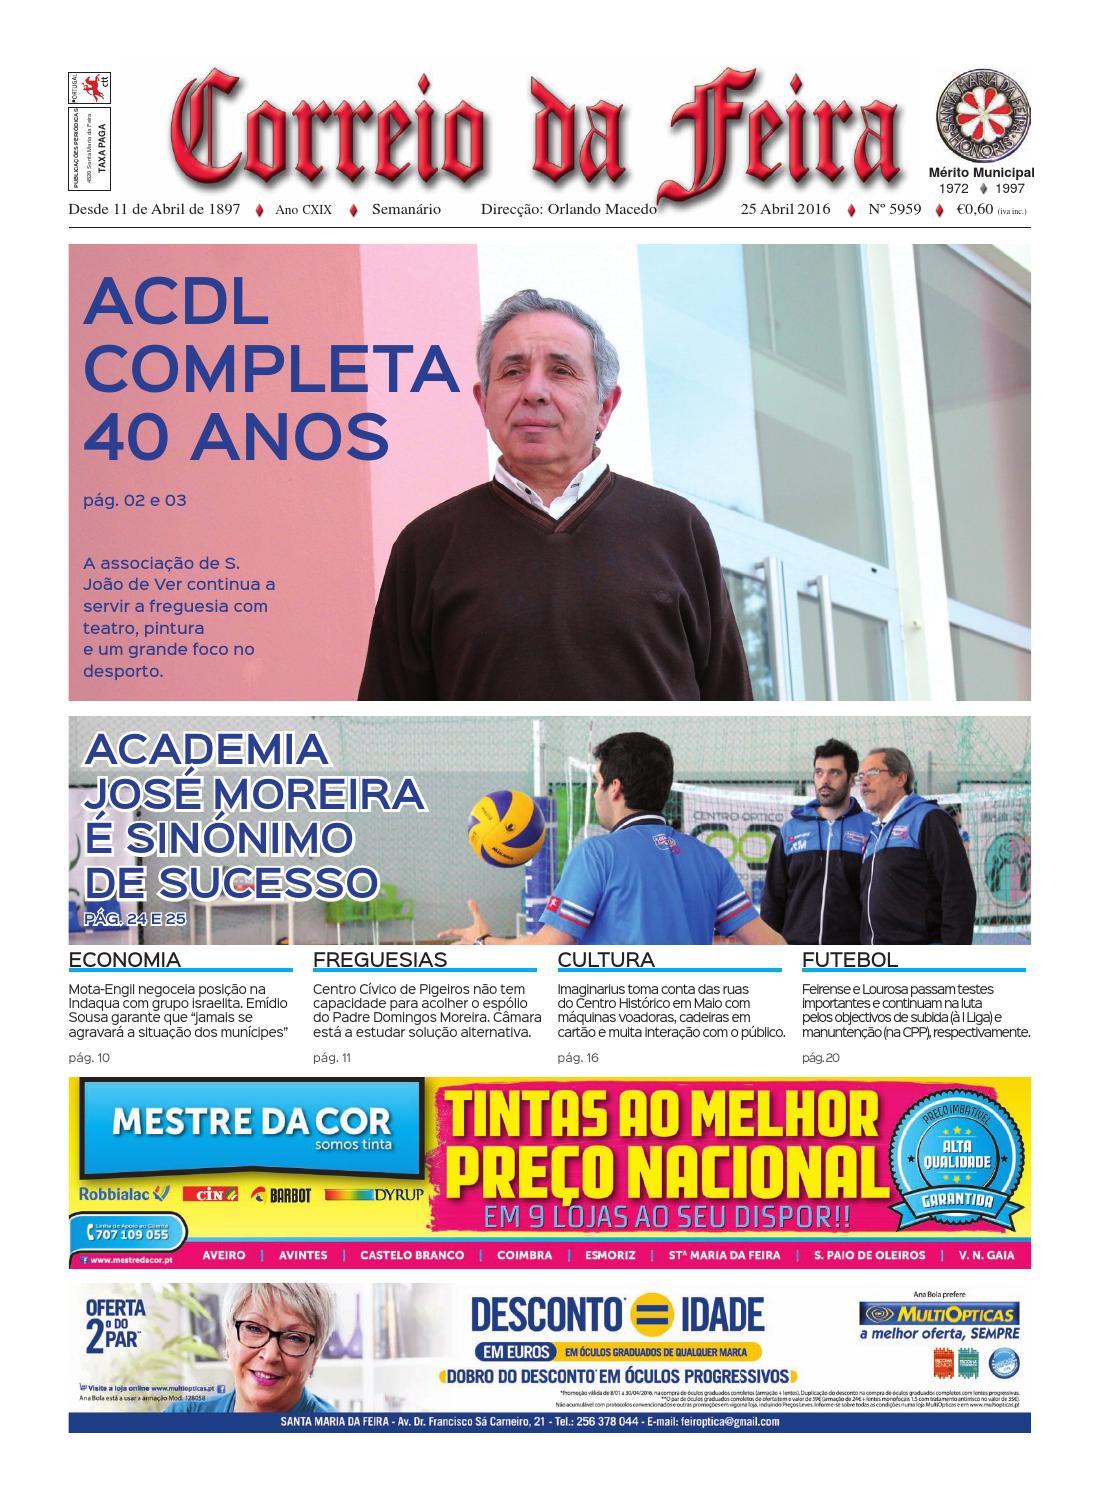 5959 by Pedro Almeida - issuu 8ebeed3eac